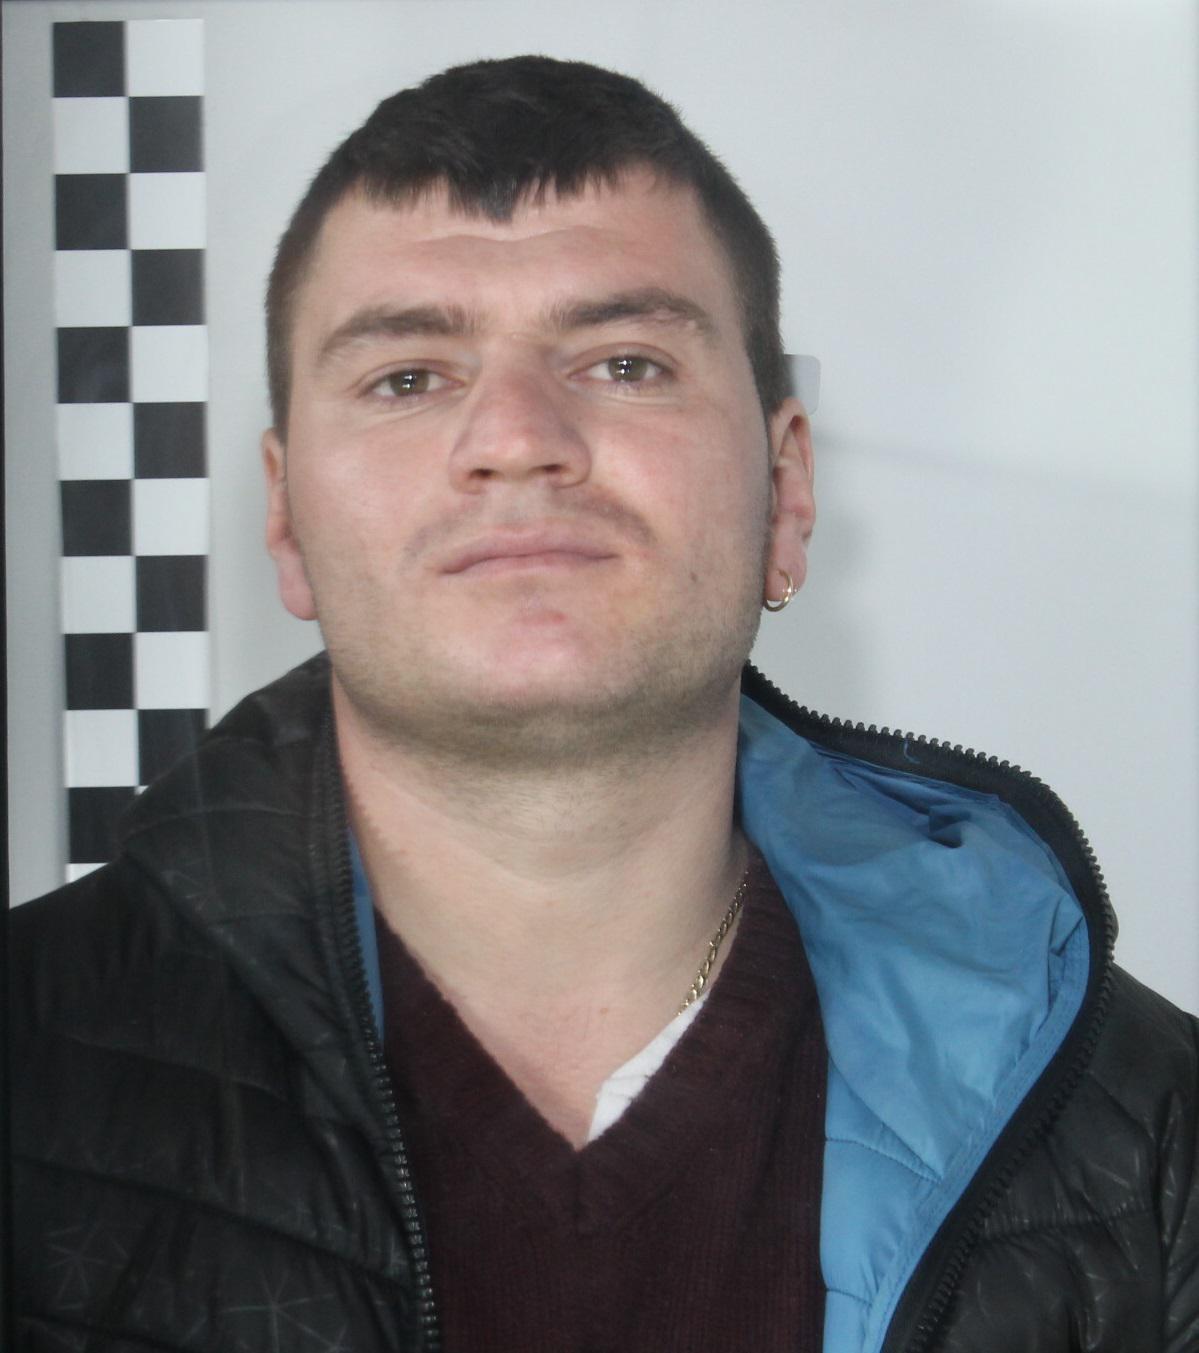 Agrigento. Arrestato romeno su cui pendeva un mandato europeo